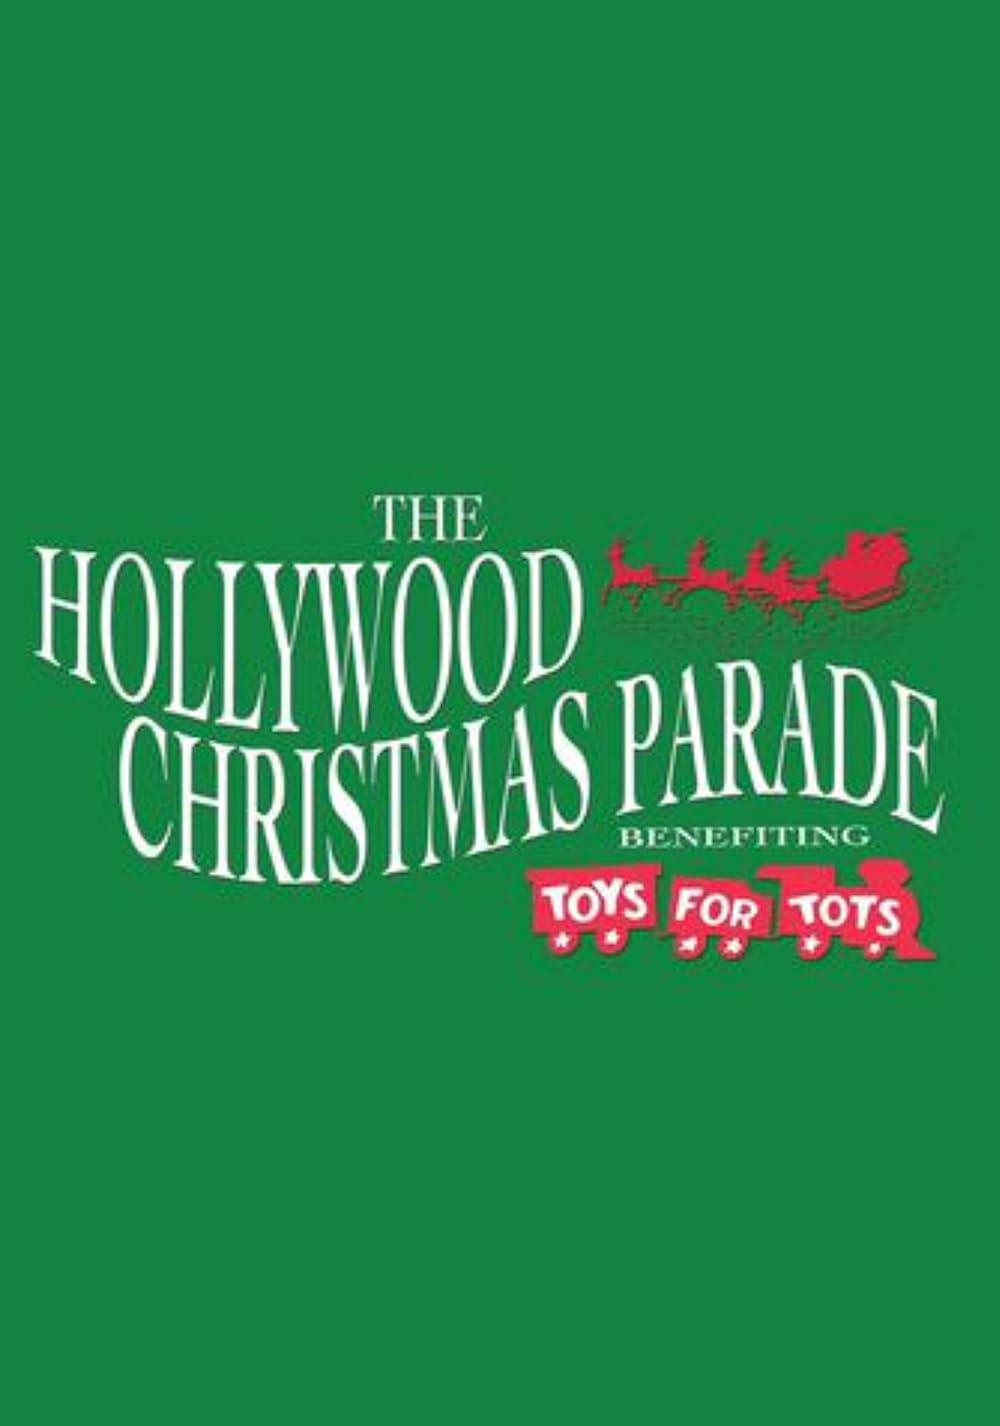 Christmas Parade Hollywood 2021